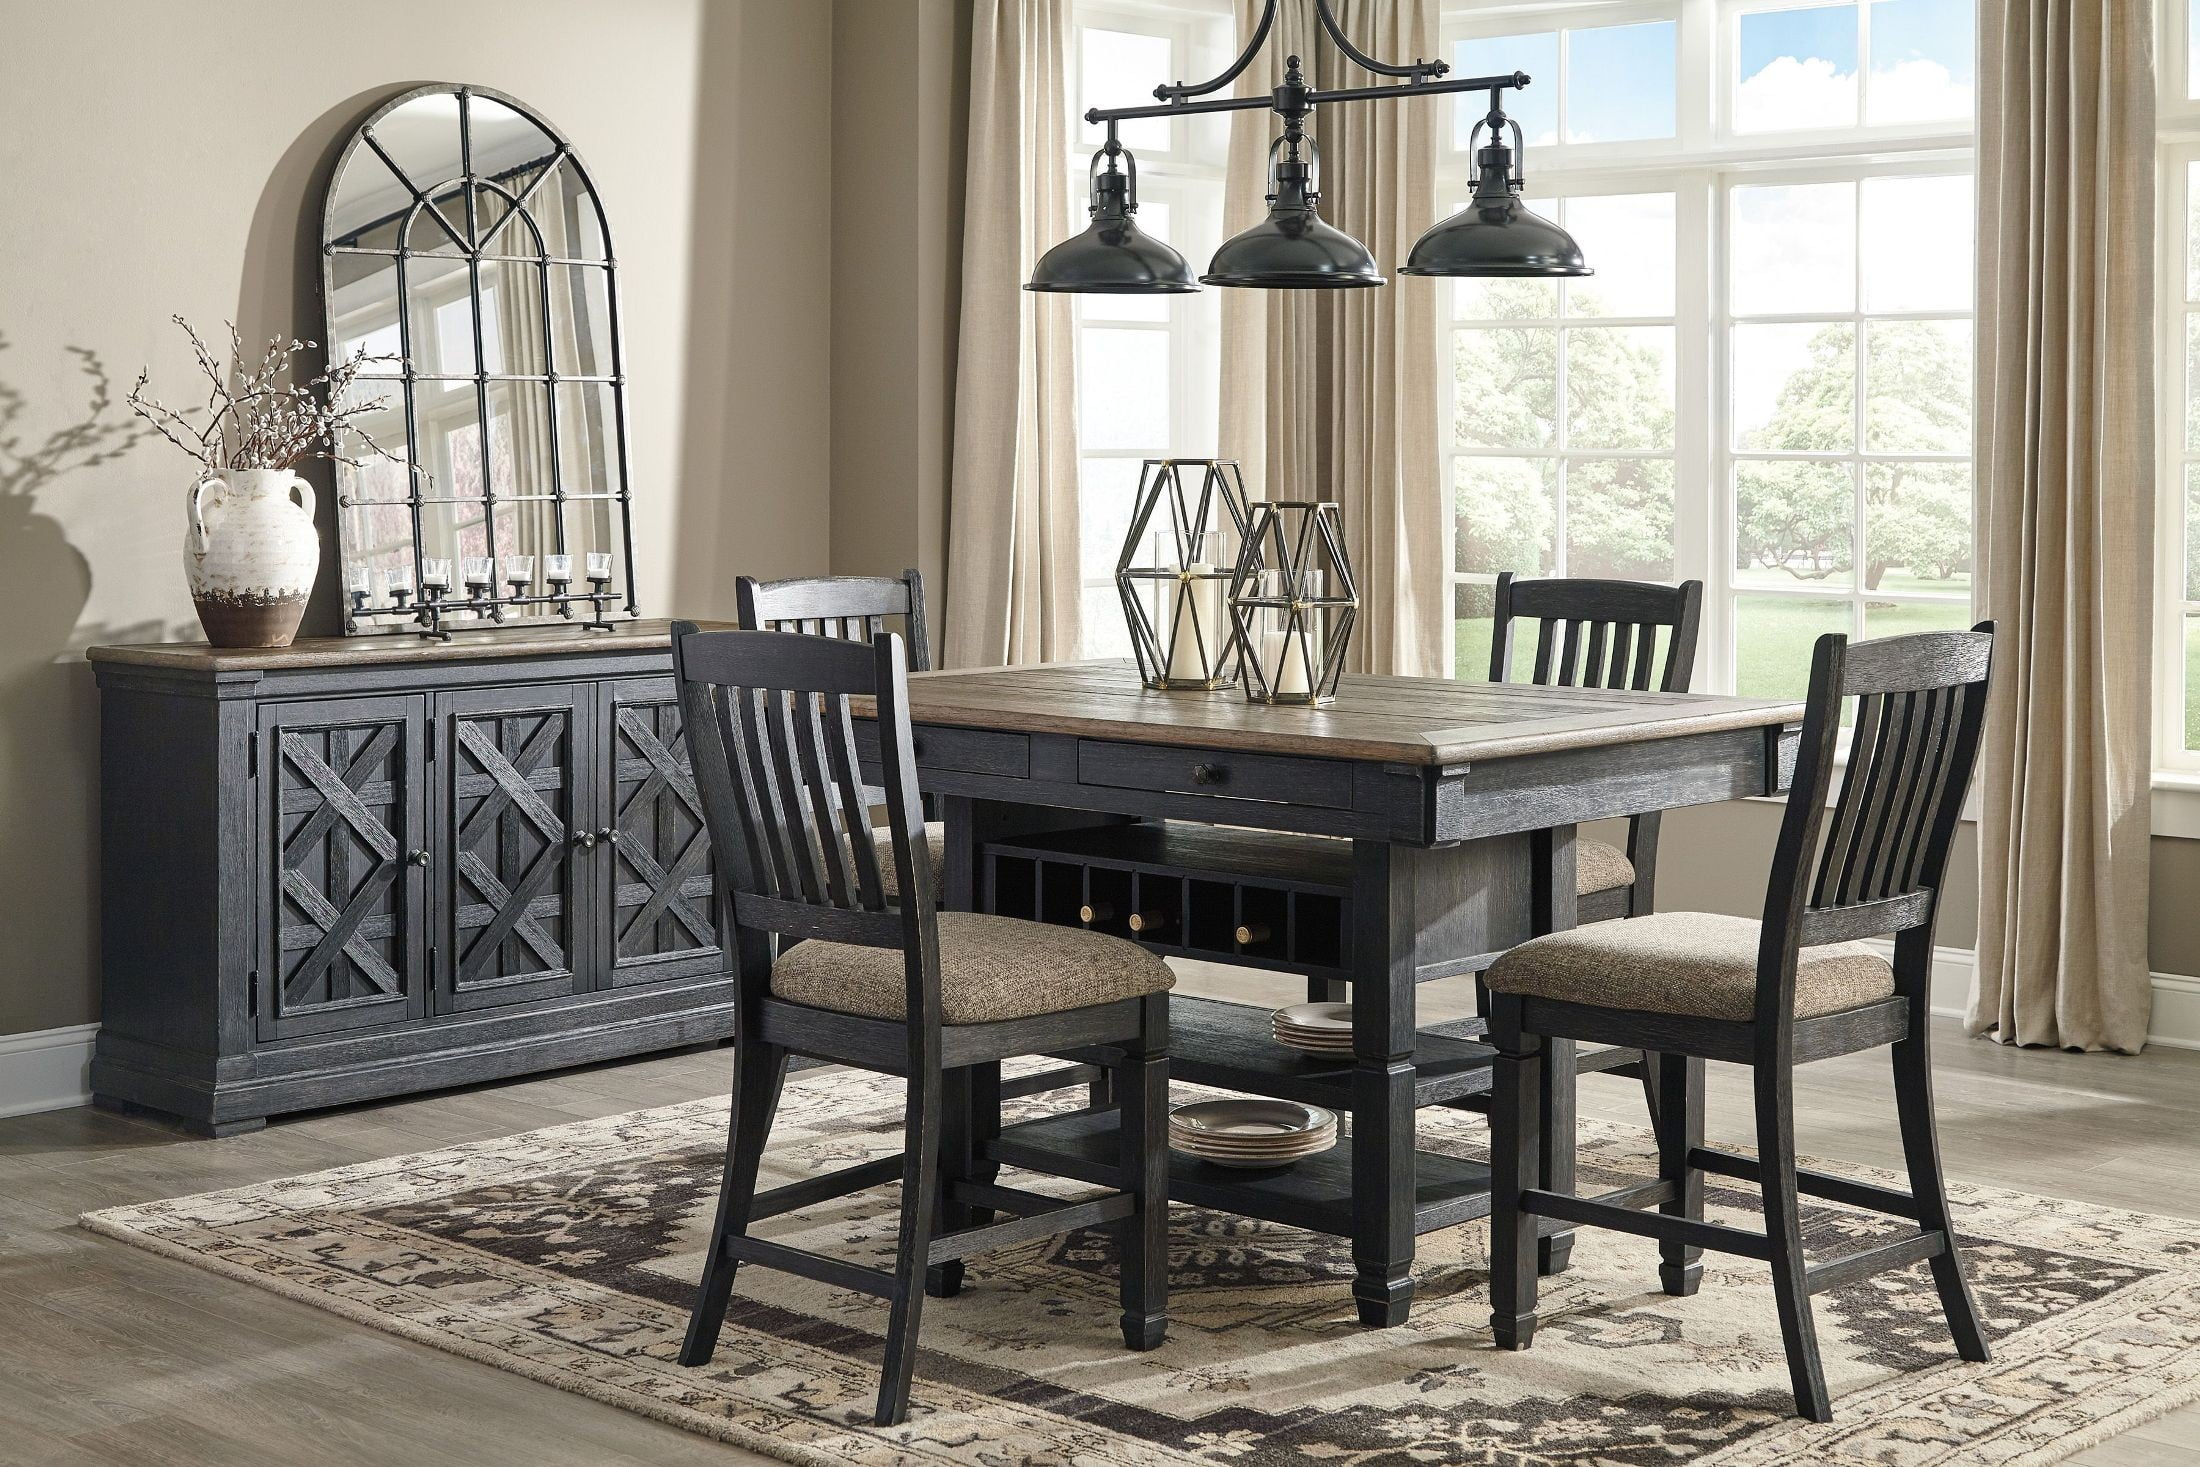 Tyler Creek Black and Gray Rectangular Counter Height Dining Room Set